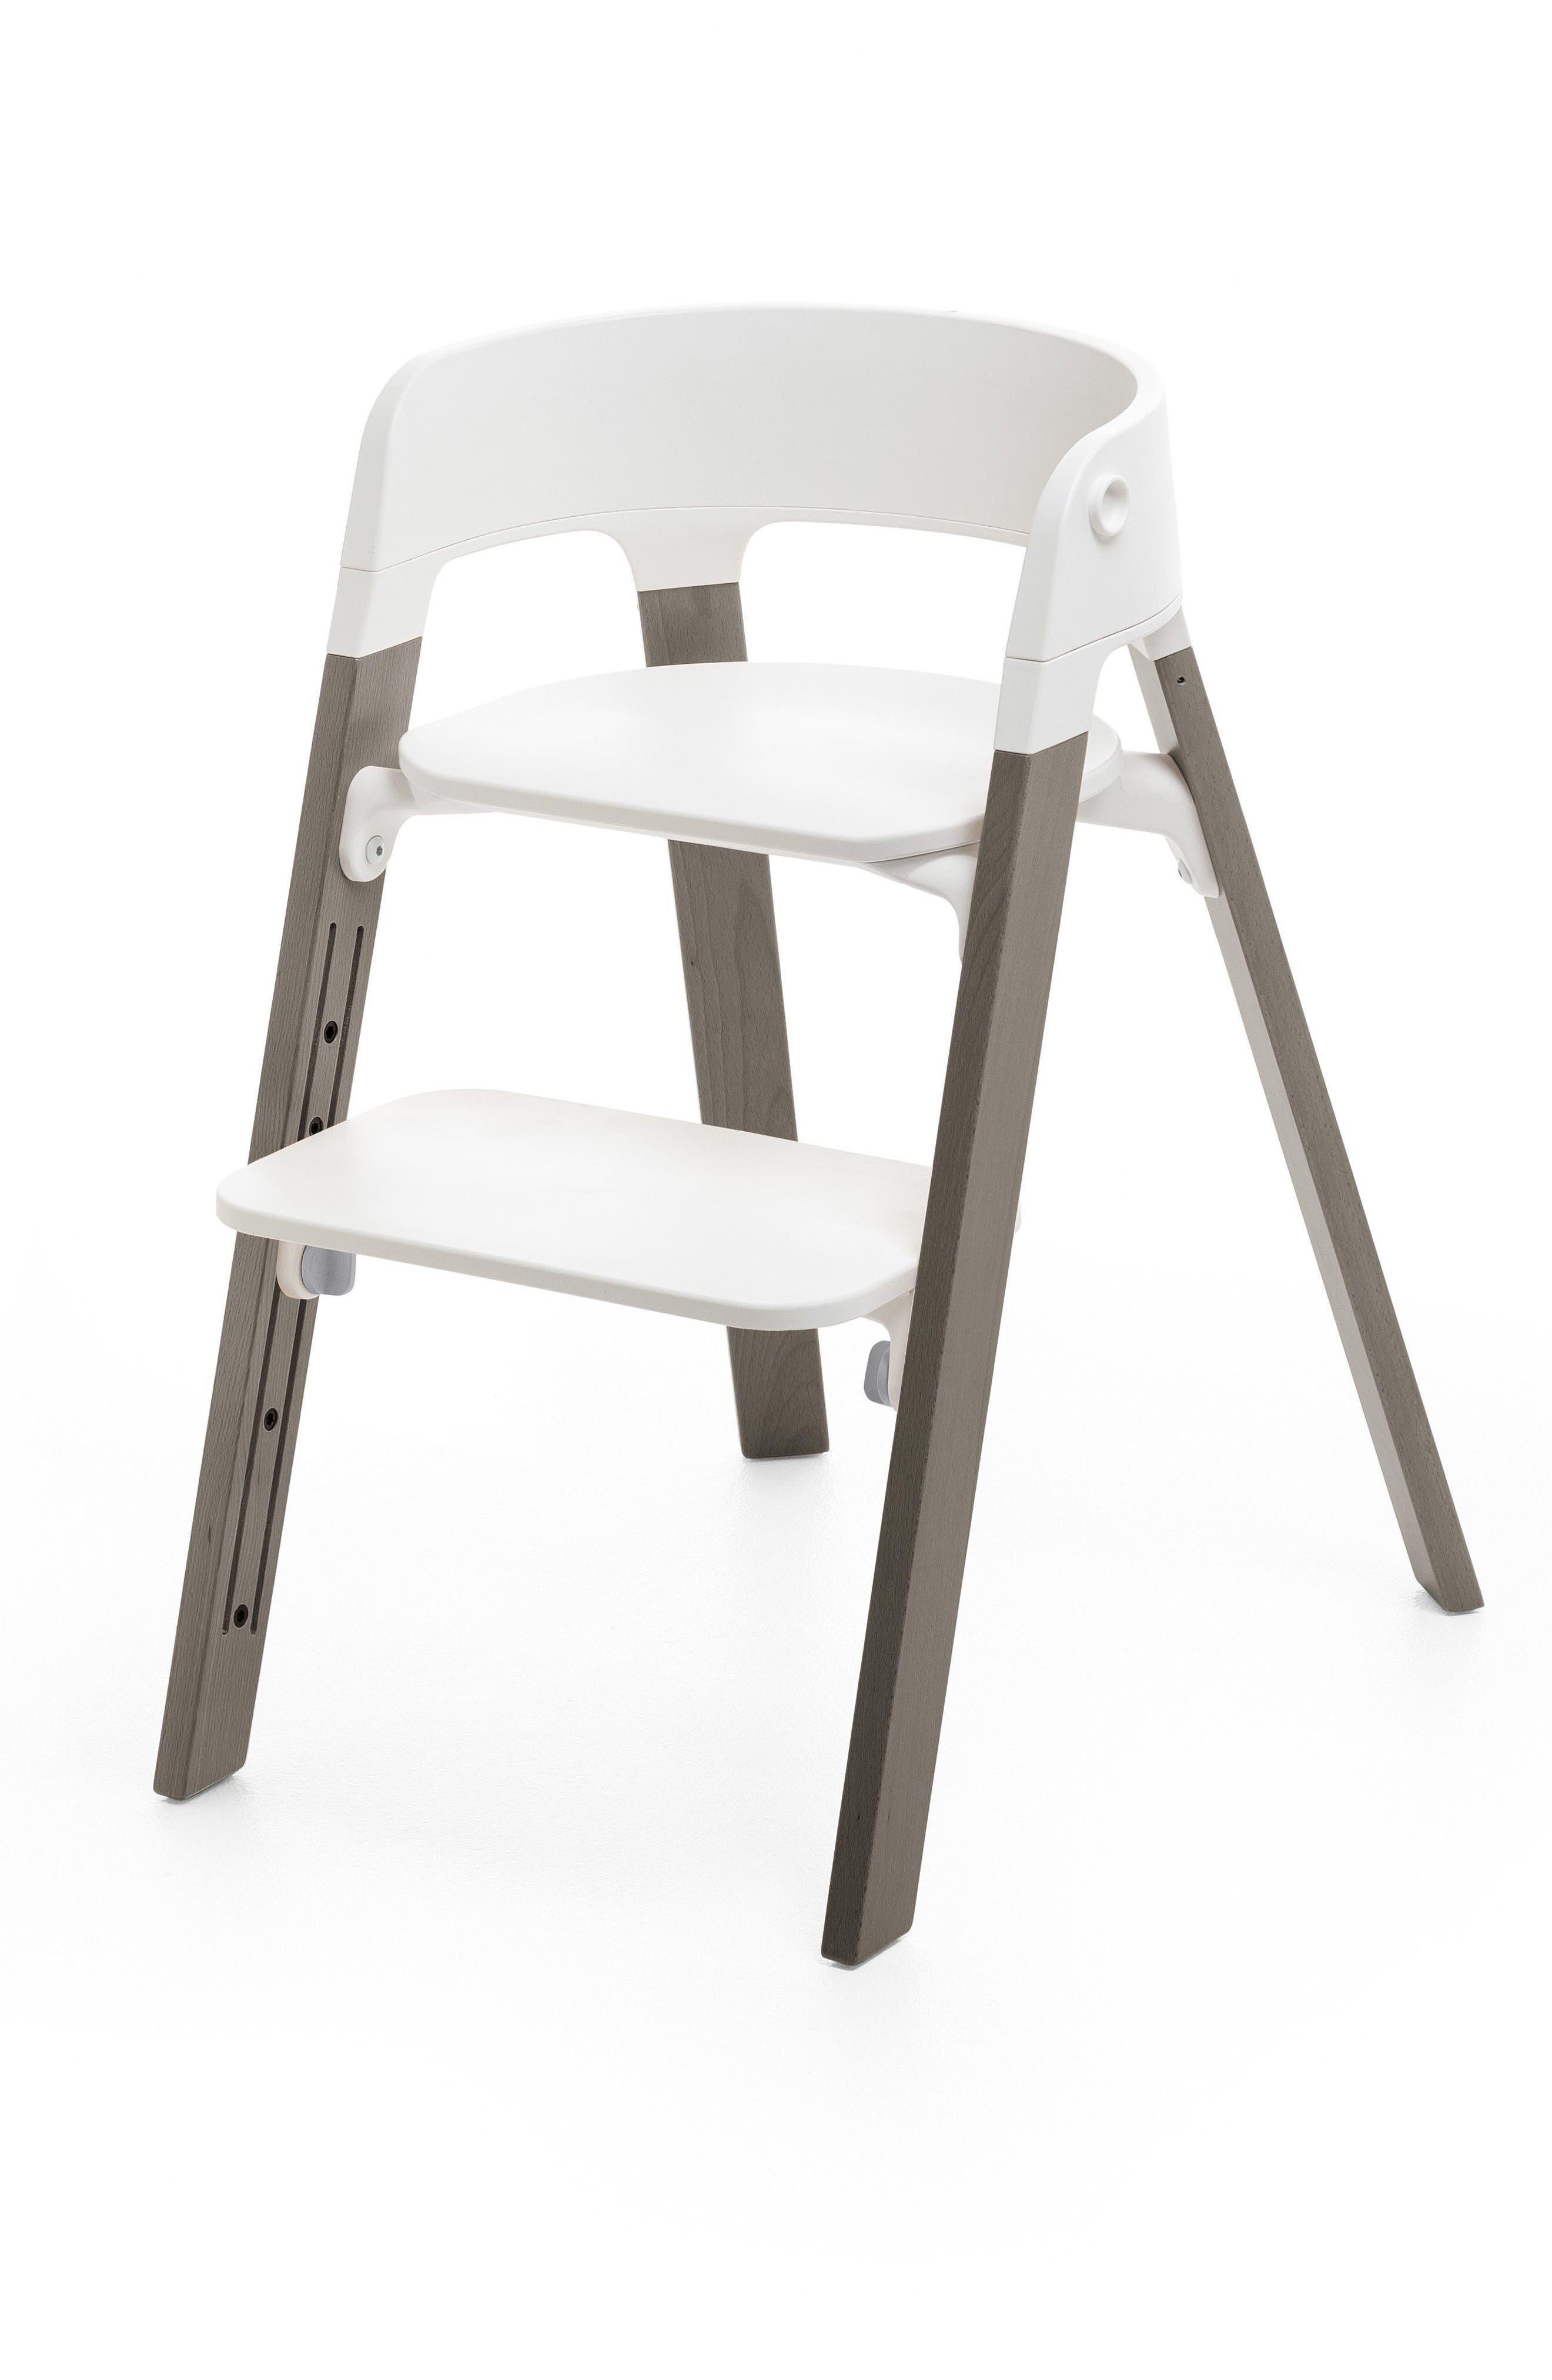 Main Image - Stokke Steps™ Chair Legs